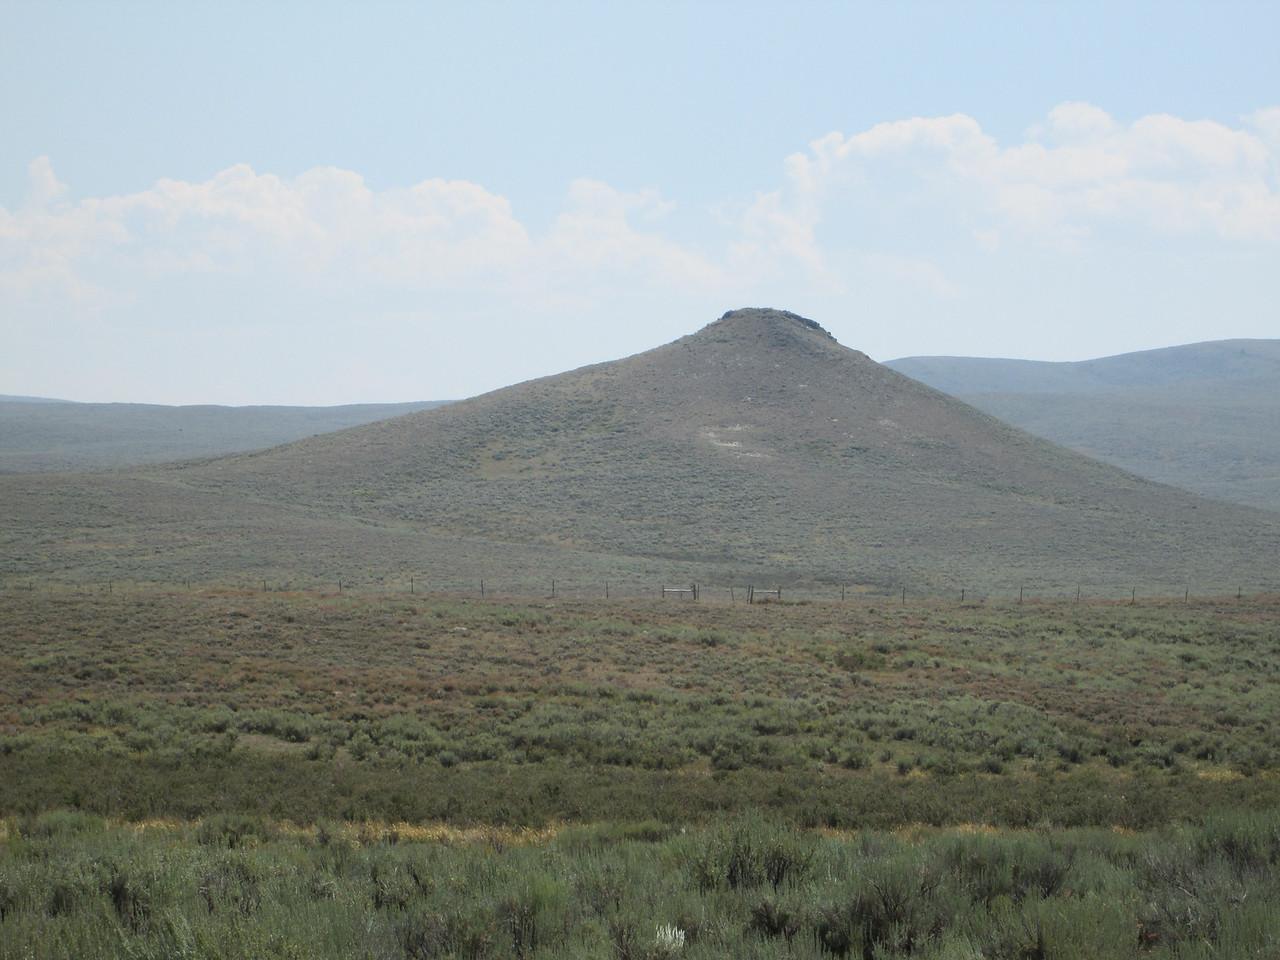 20130814 Antelope Peak on the Dufner Ranch